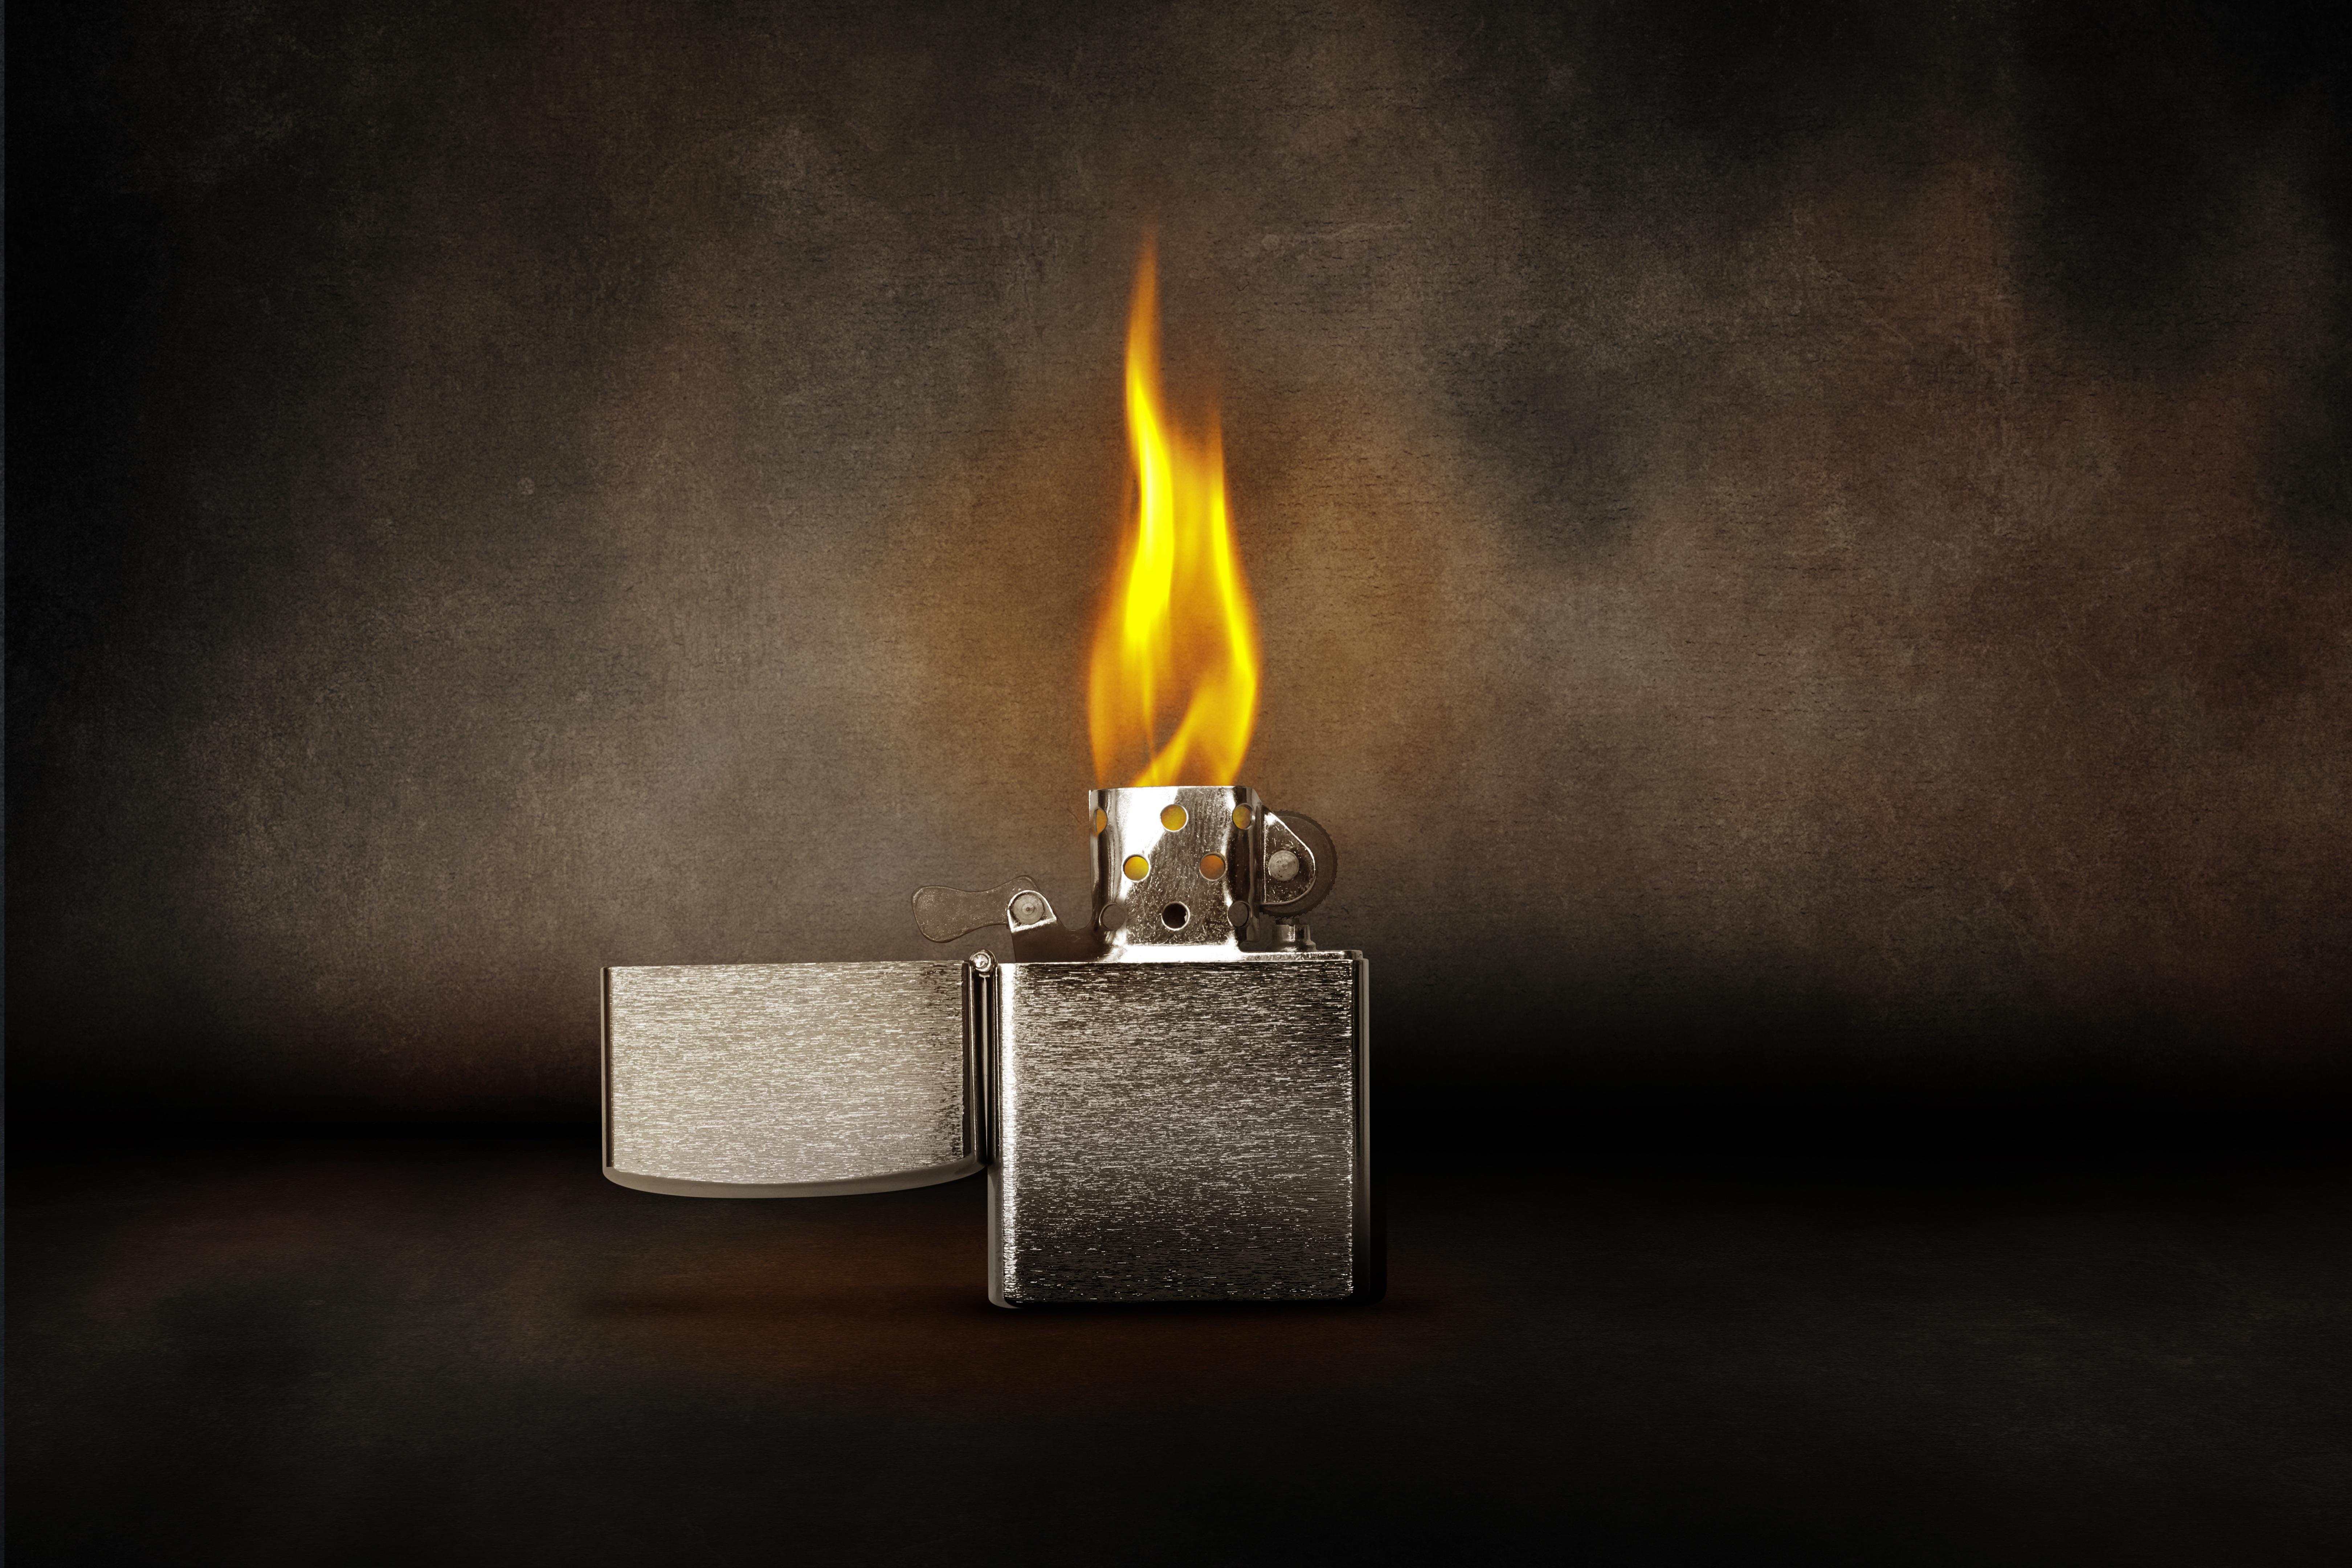 lighter flame burning 1574938681 - Lighter Flame Burning -